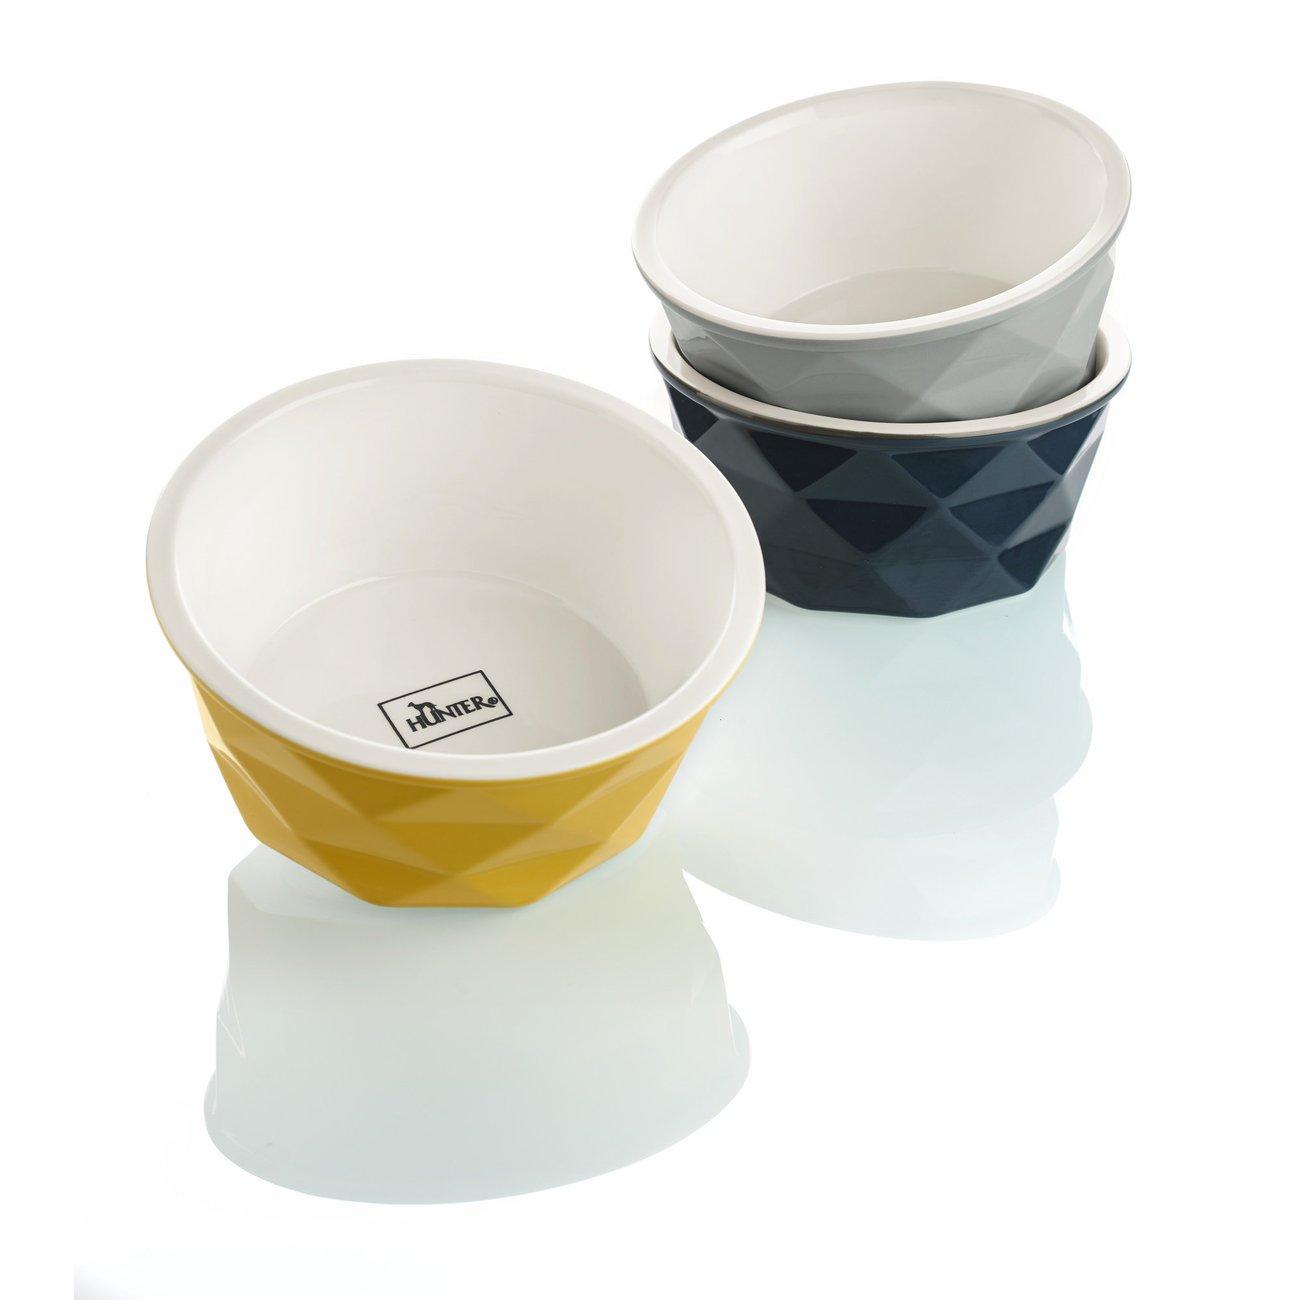 Hunter Keramik Napf Eiby 68648